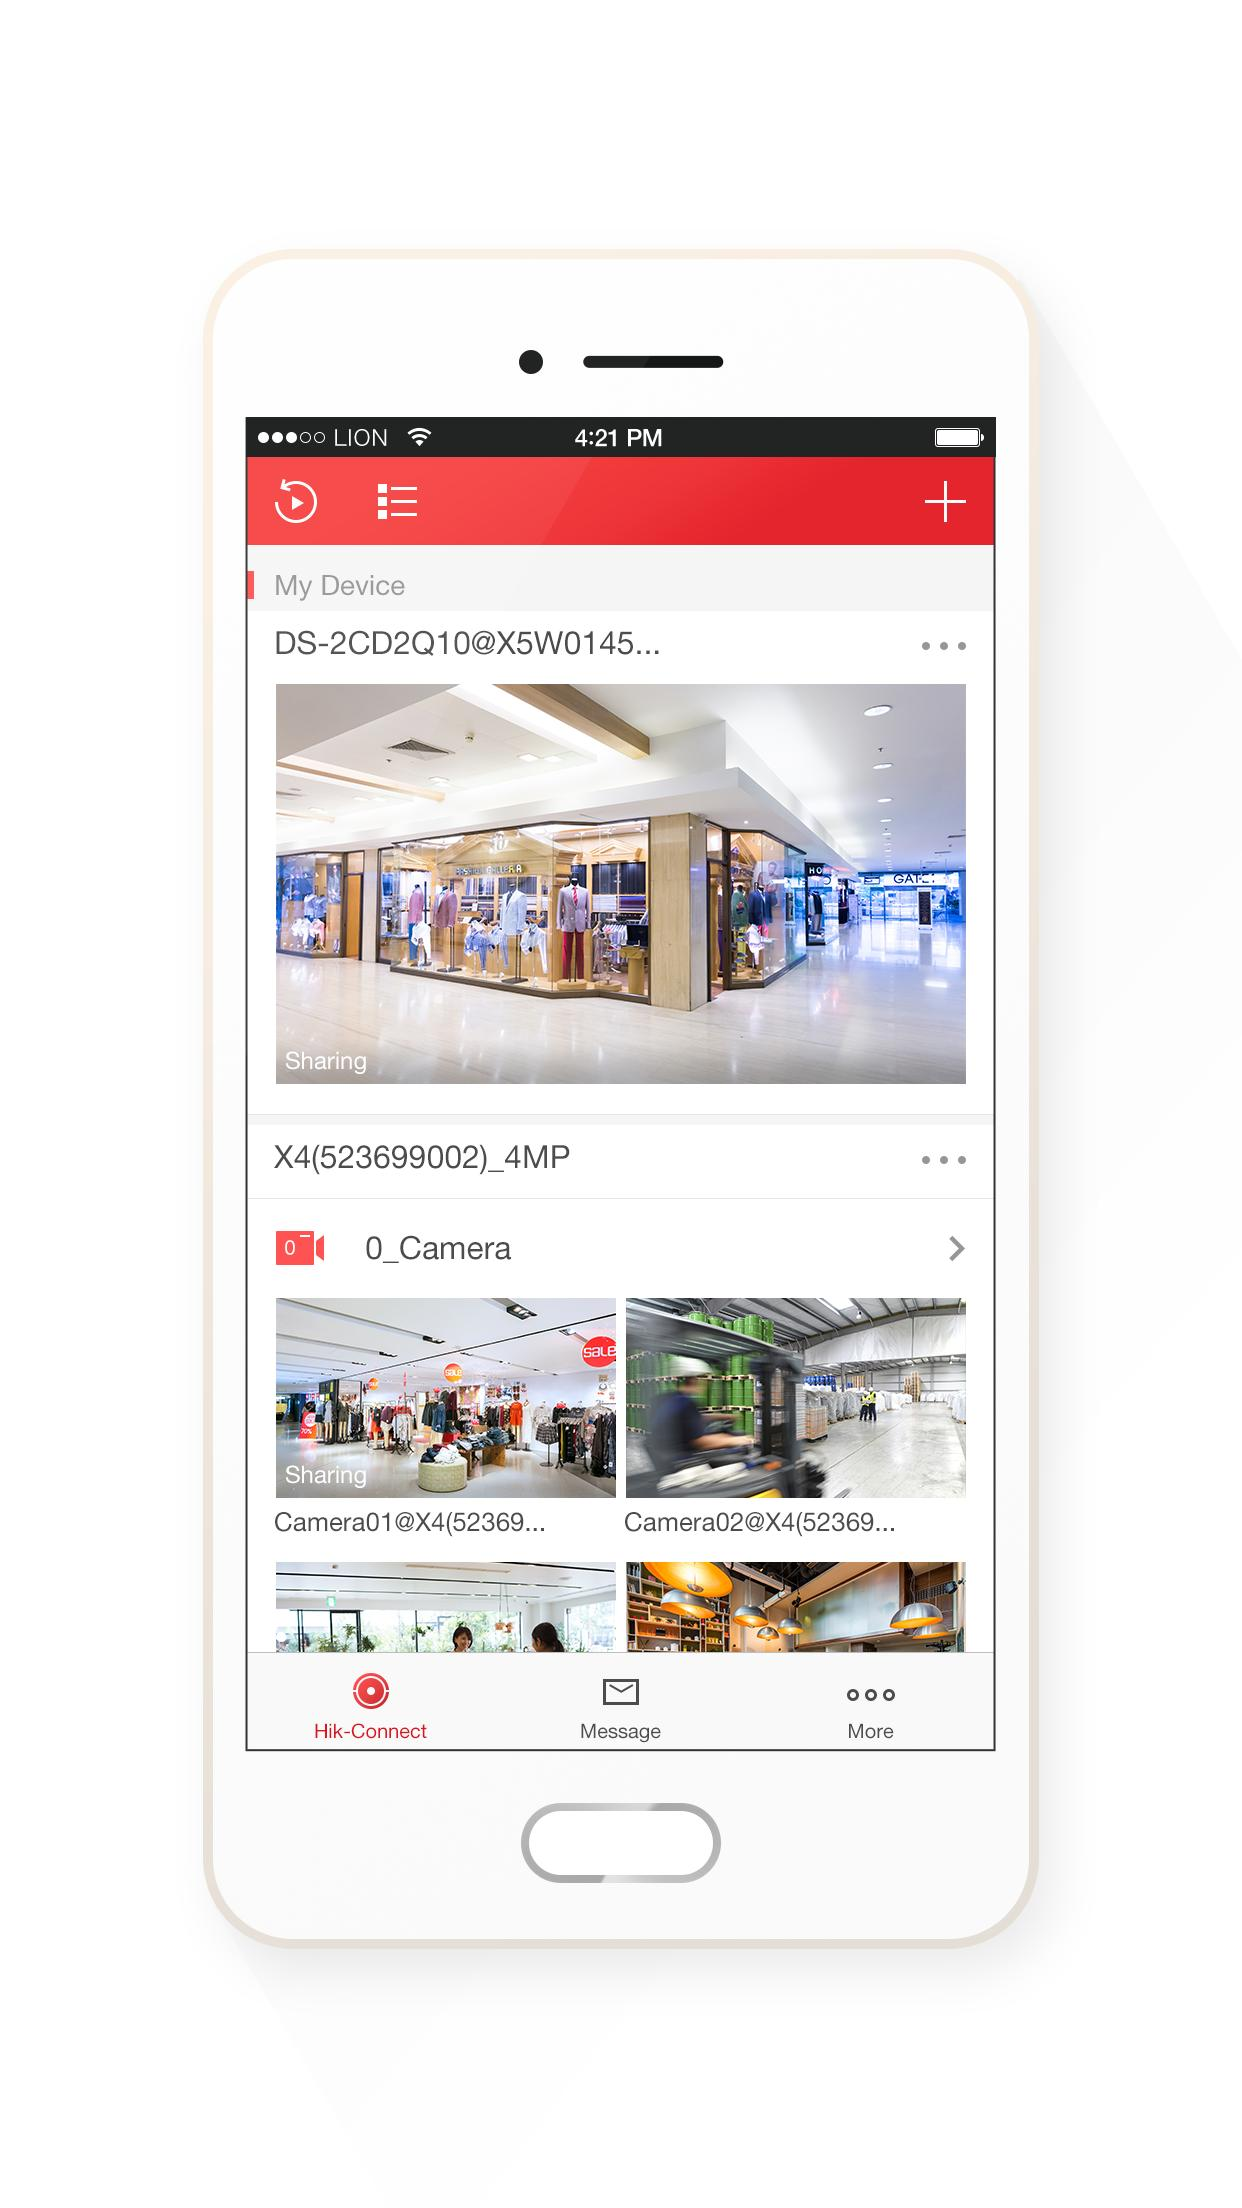 Hik Connect تحميل تطبيقات كاميرات هيك فيجن للموبايل apk